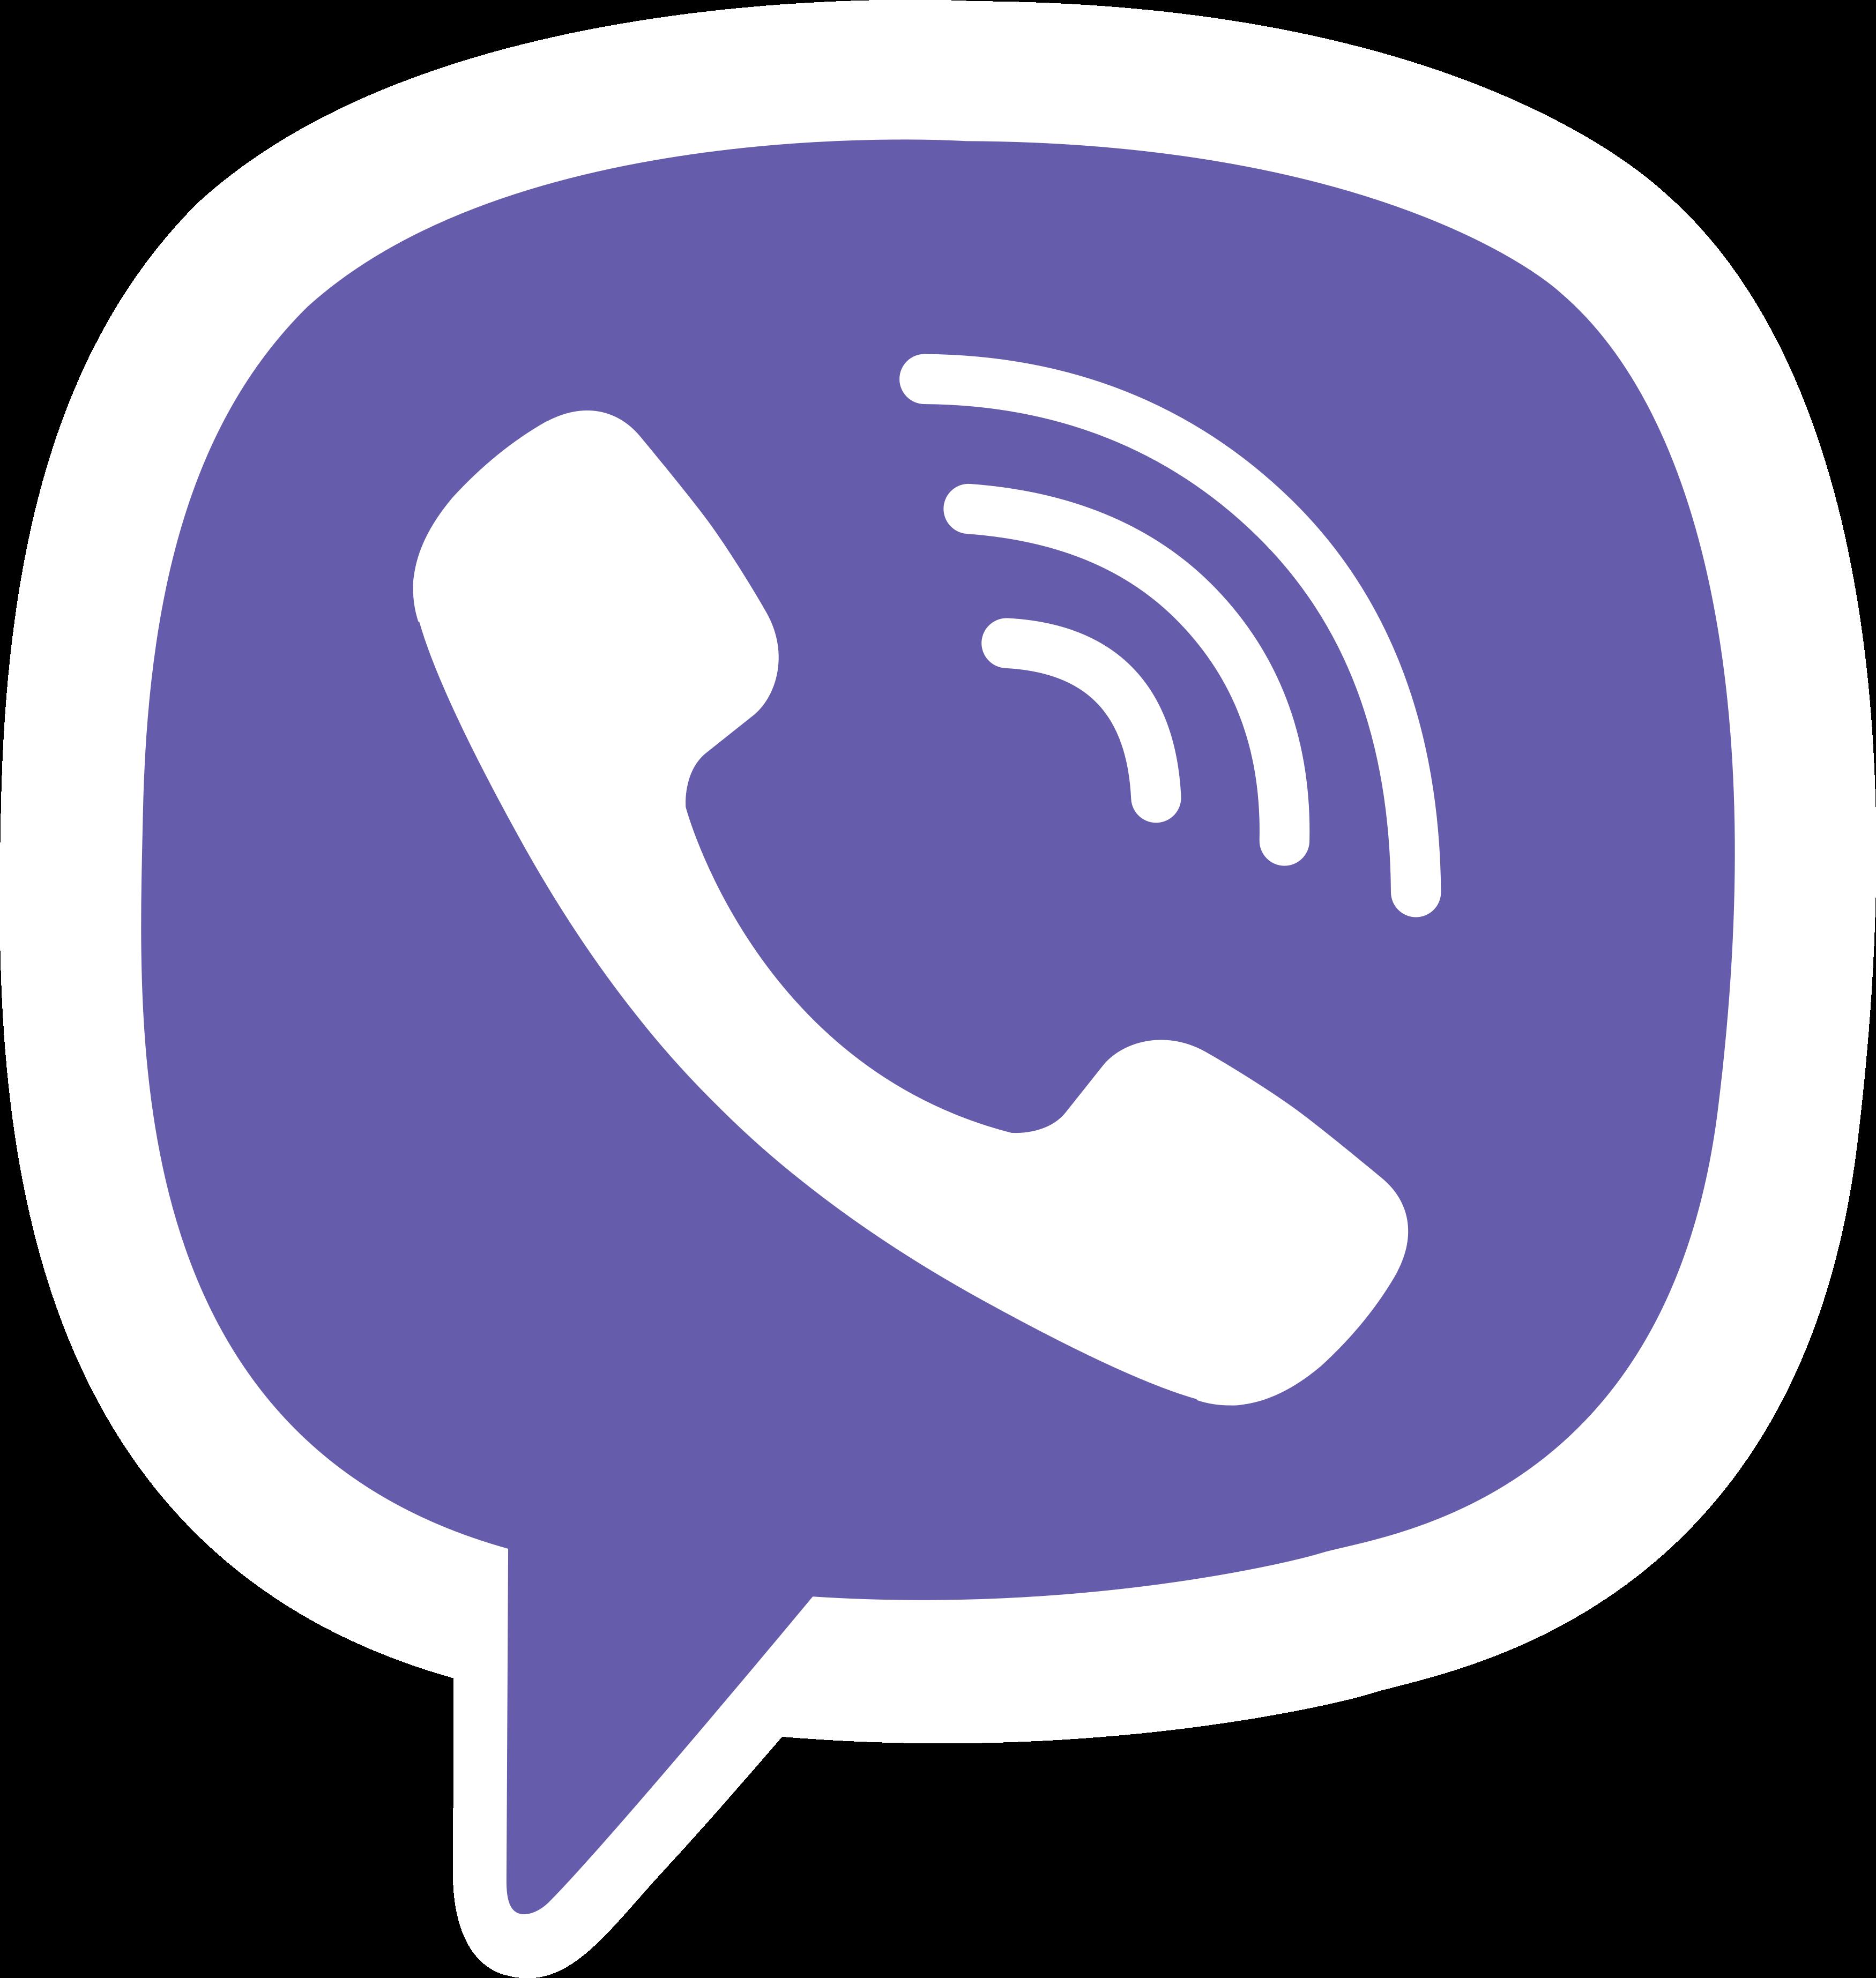 viber logo icon 1 - Rakuten Viber Logo - Icon